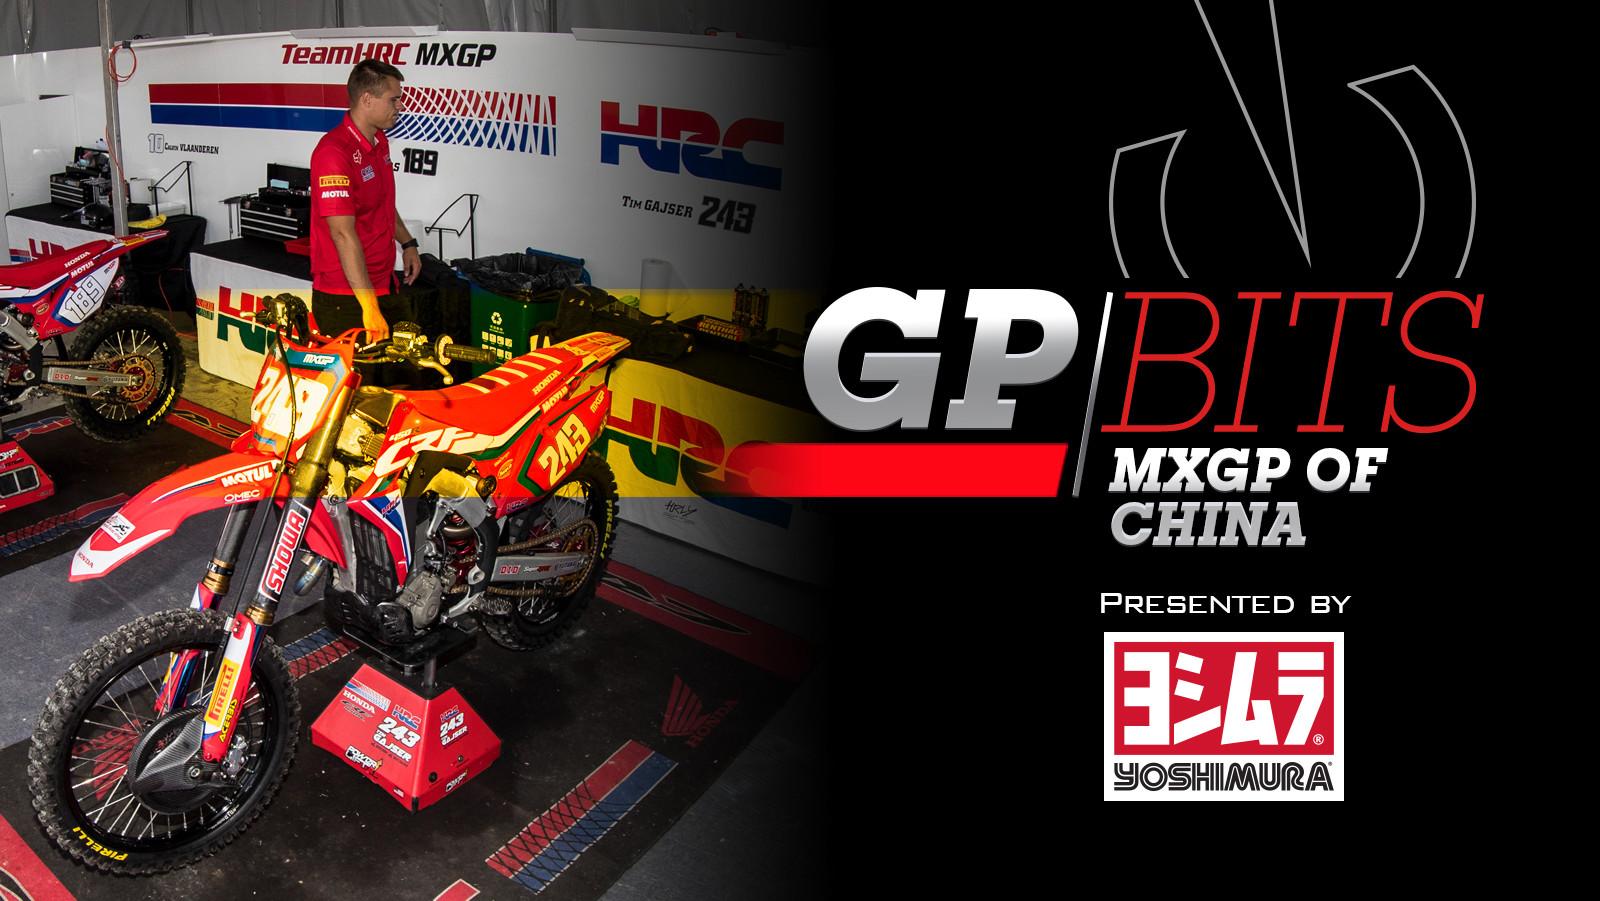 GP Bits: MXGP of China | Round 18